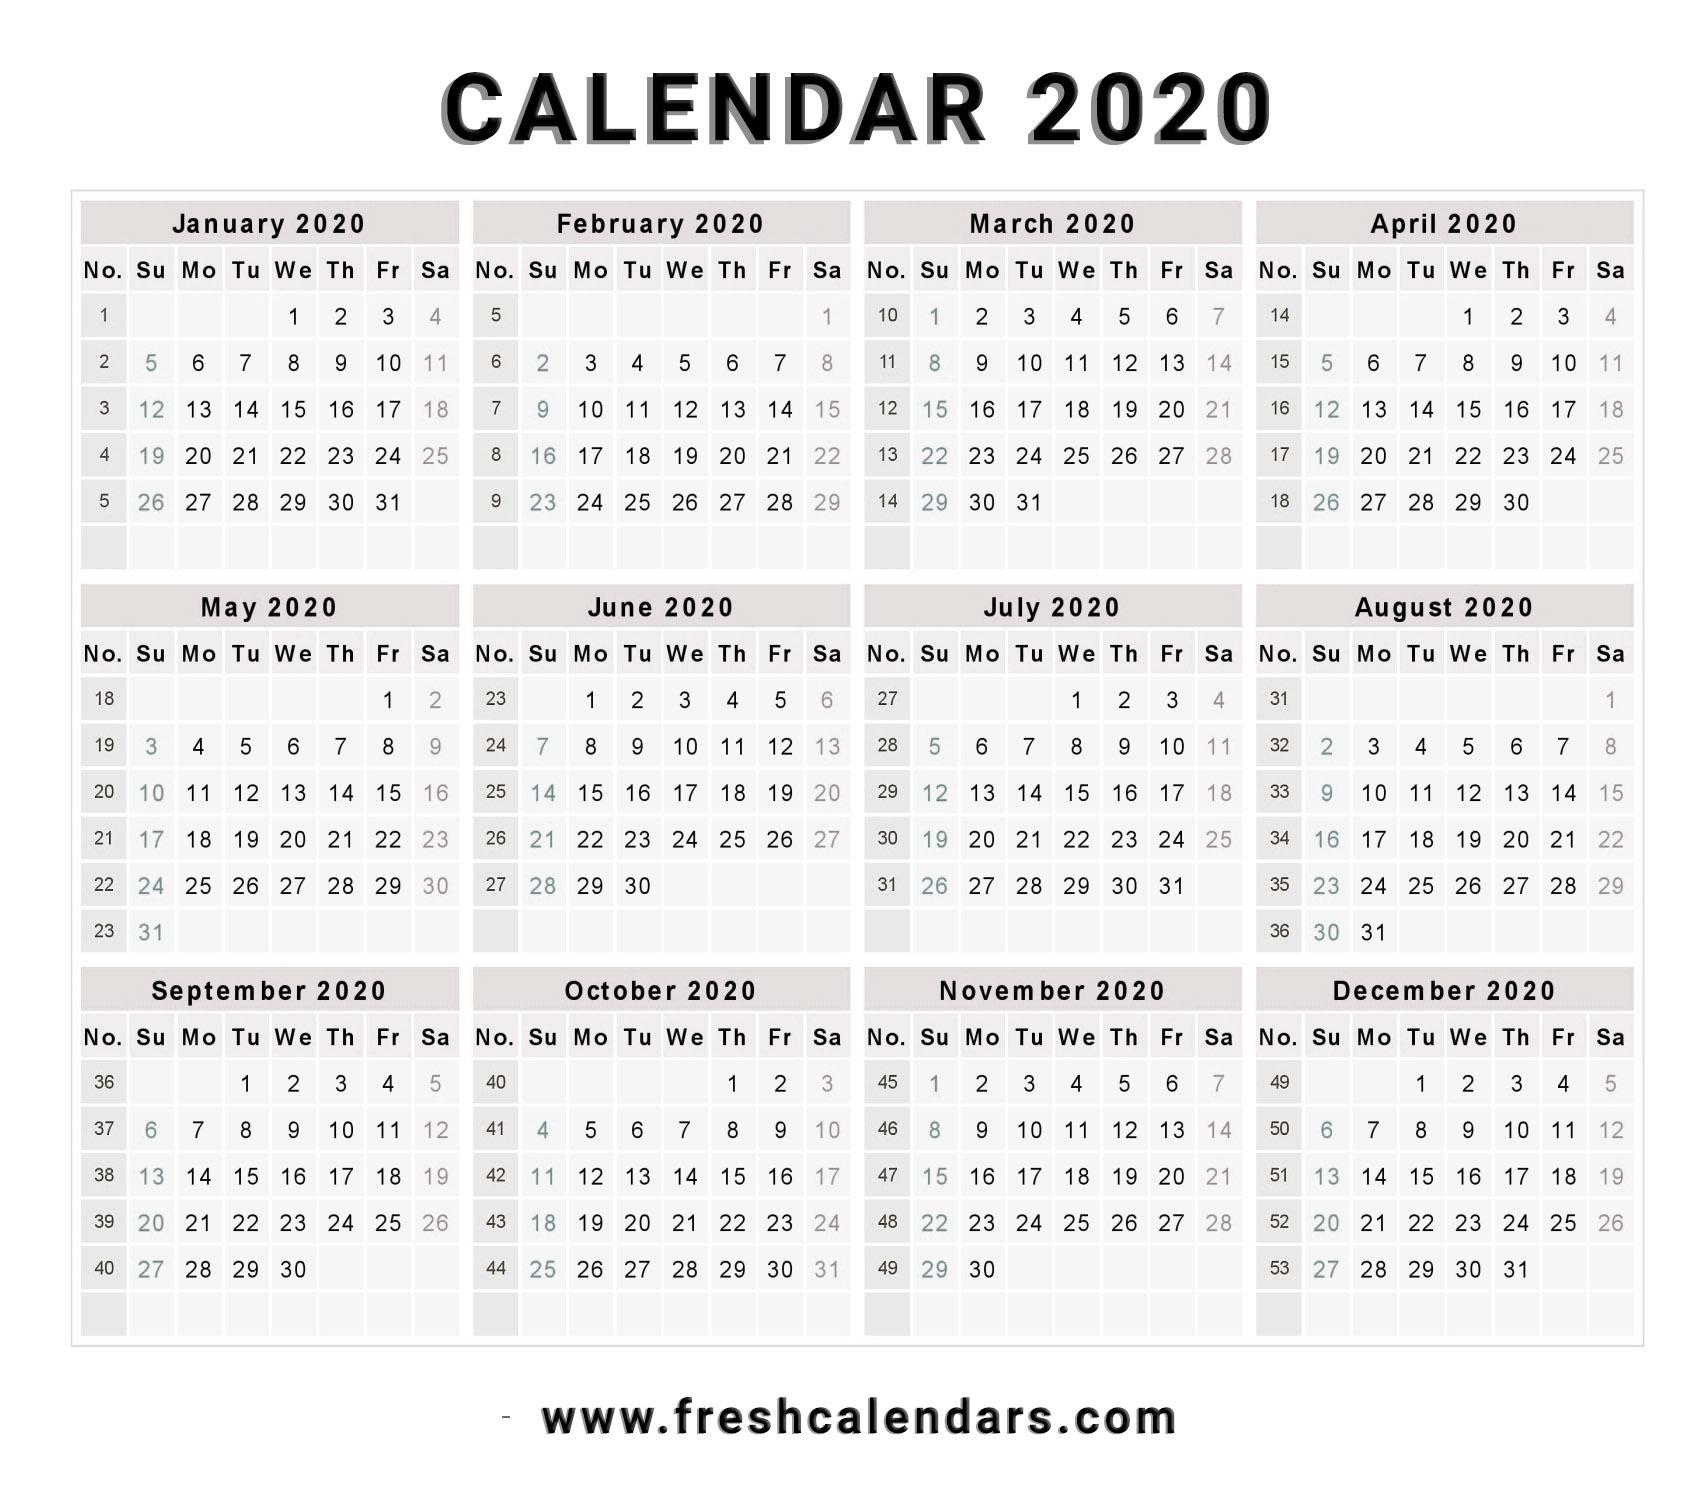 2020 Calendar Printable (1) | Download 2019 Calendar Printable With 2020 Calendar Holiday List